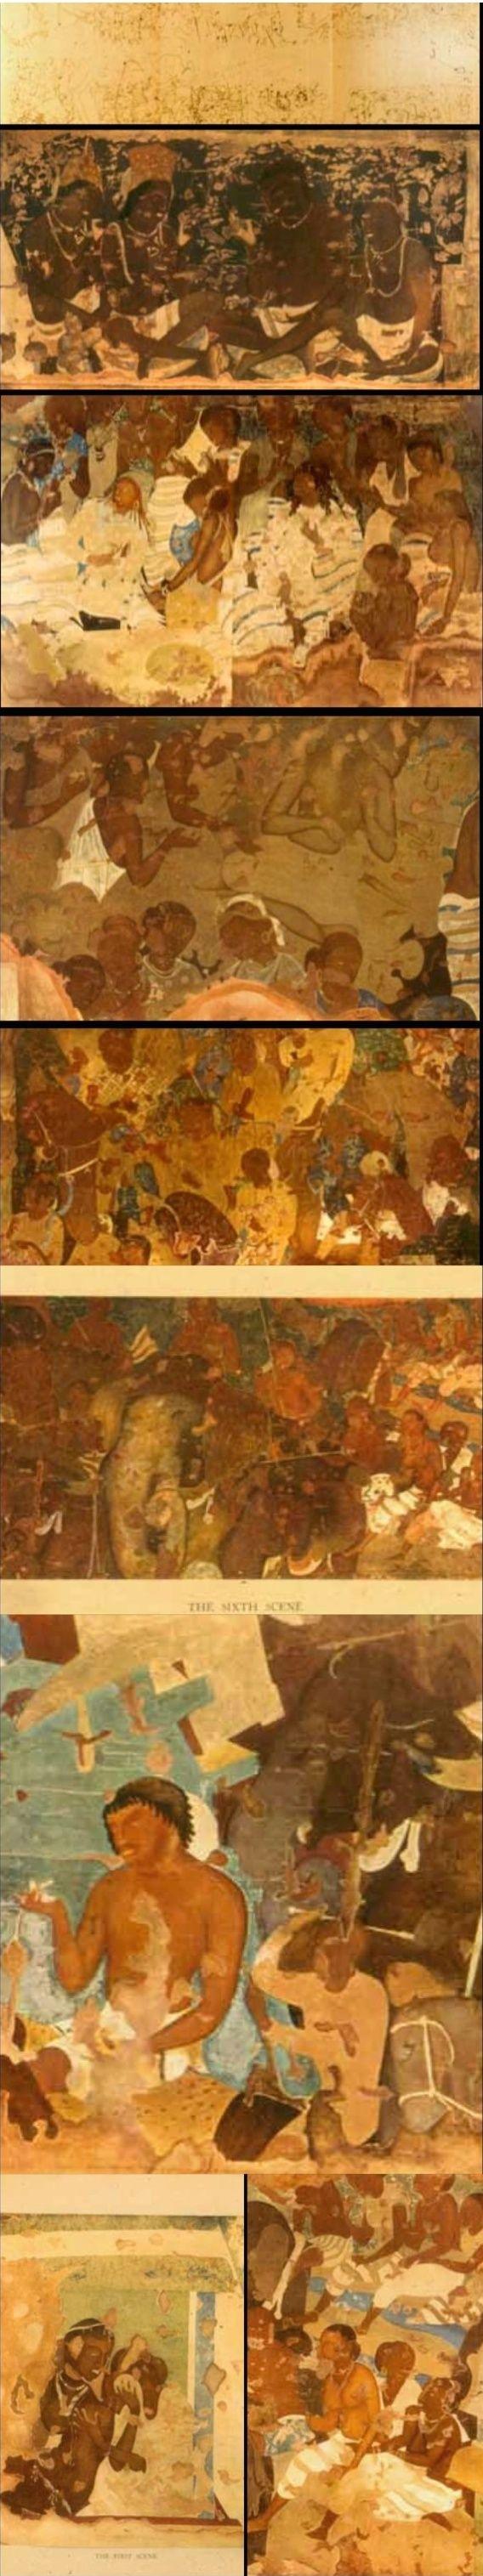 209 best indian mural art images on pinterest mural art murals buddhist mural on the walls of bagh caves rock cut man made caves